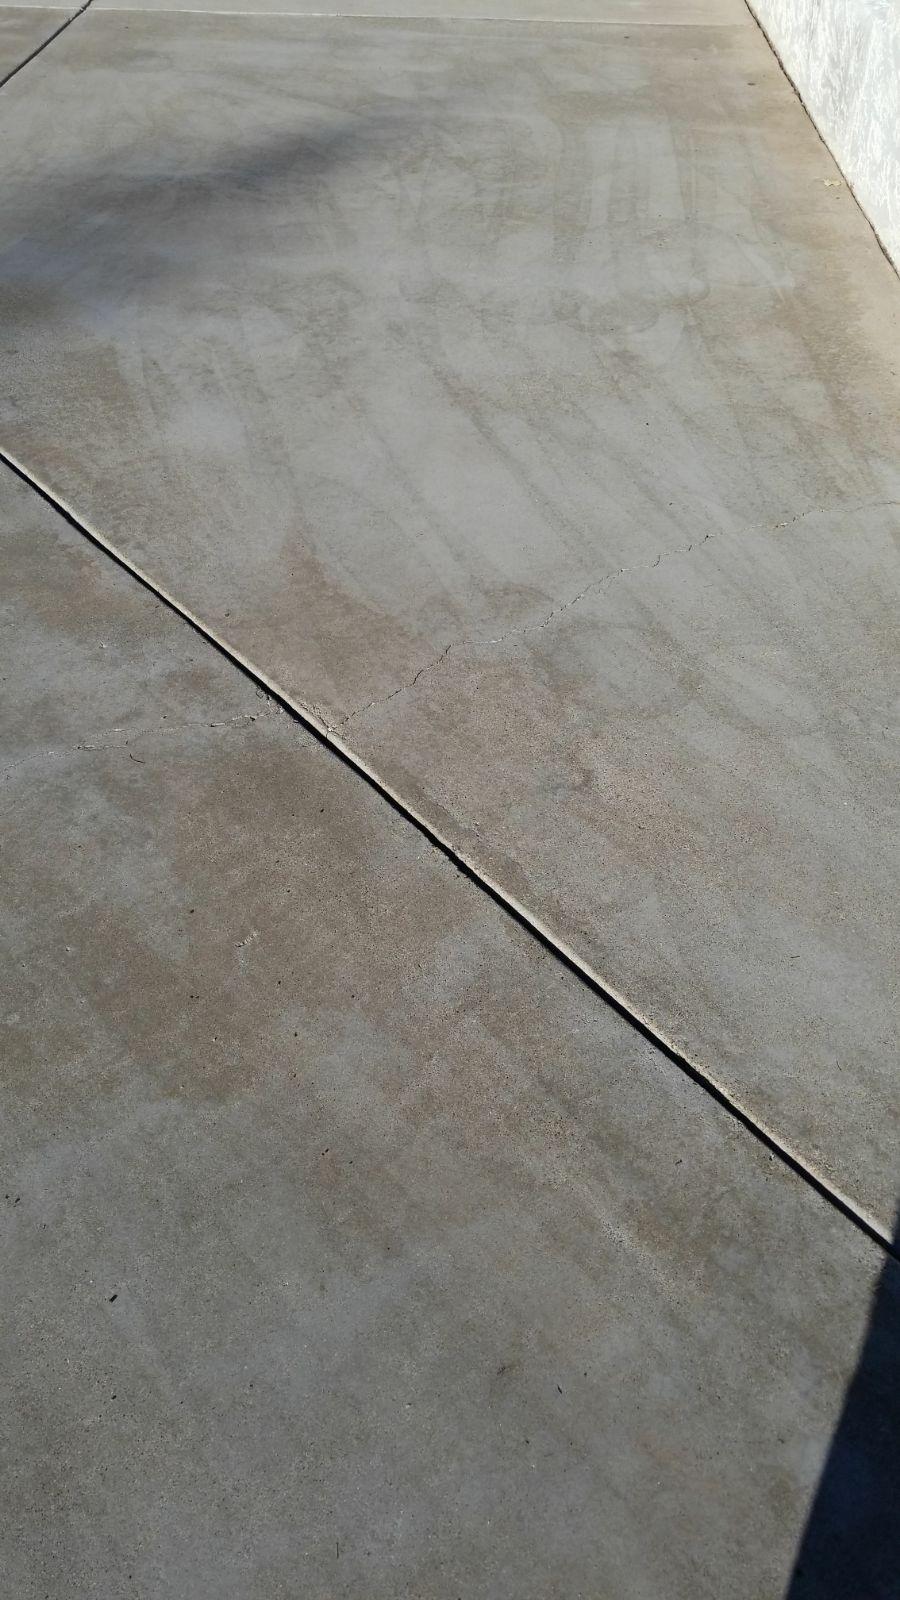 Concrete Sealing Issue-img-20171206-wa0003_1518895846527.jpg